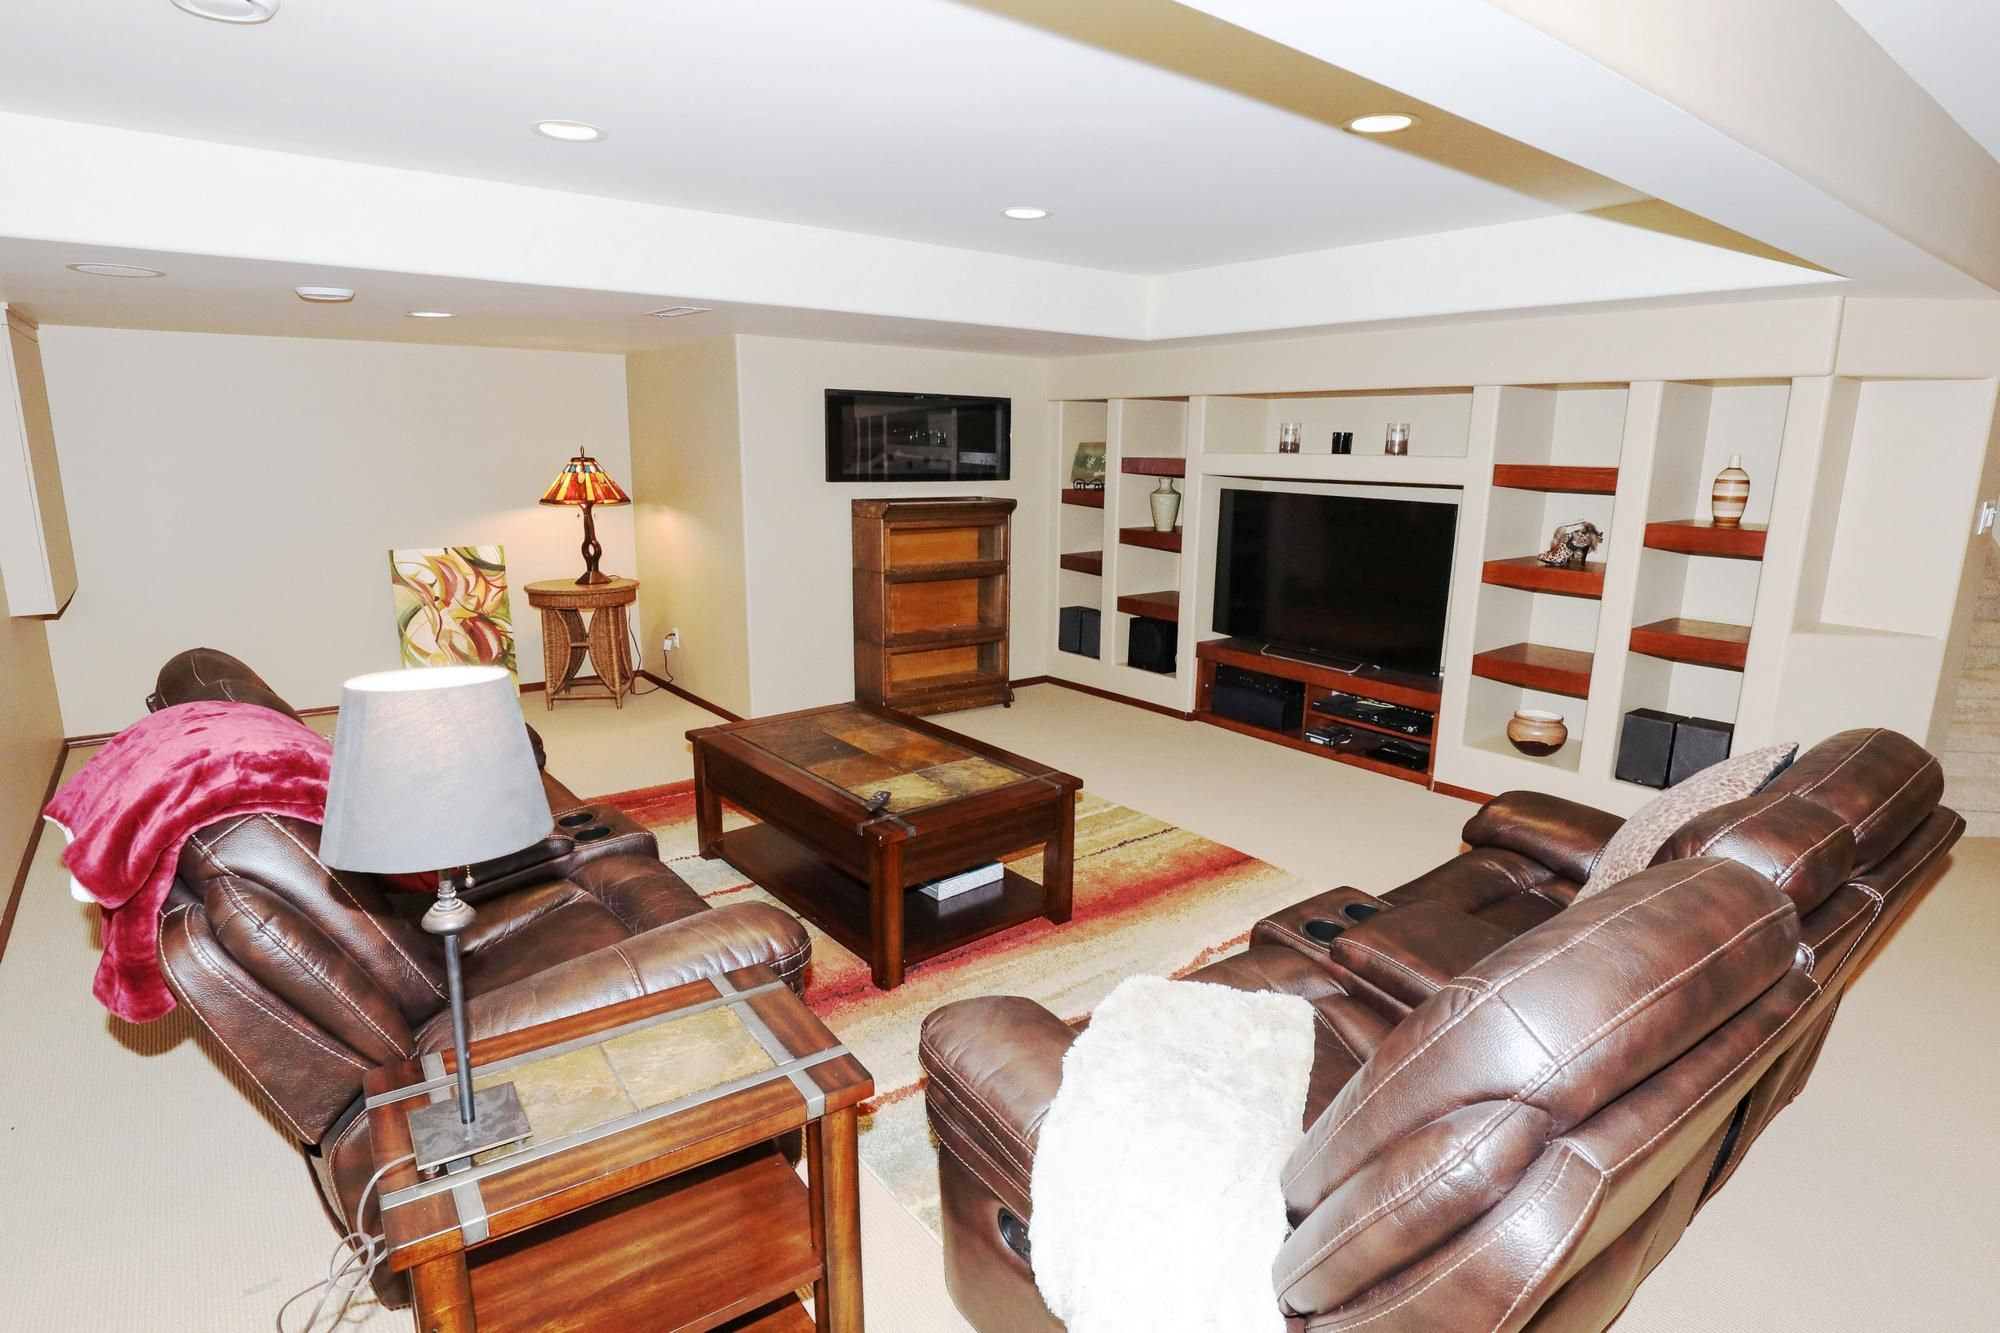 Photo 28: Photos: 7 Castle Ridge Drive in Winnipeg: Linden Ridge Single Family Detached for sale (1M)  : MLS®# 202107901